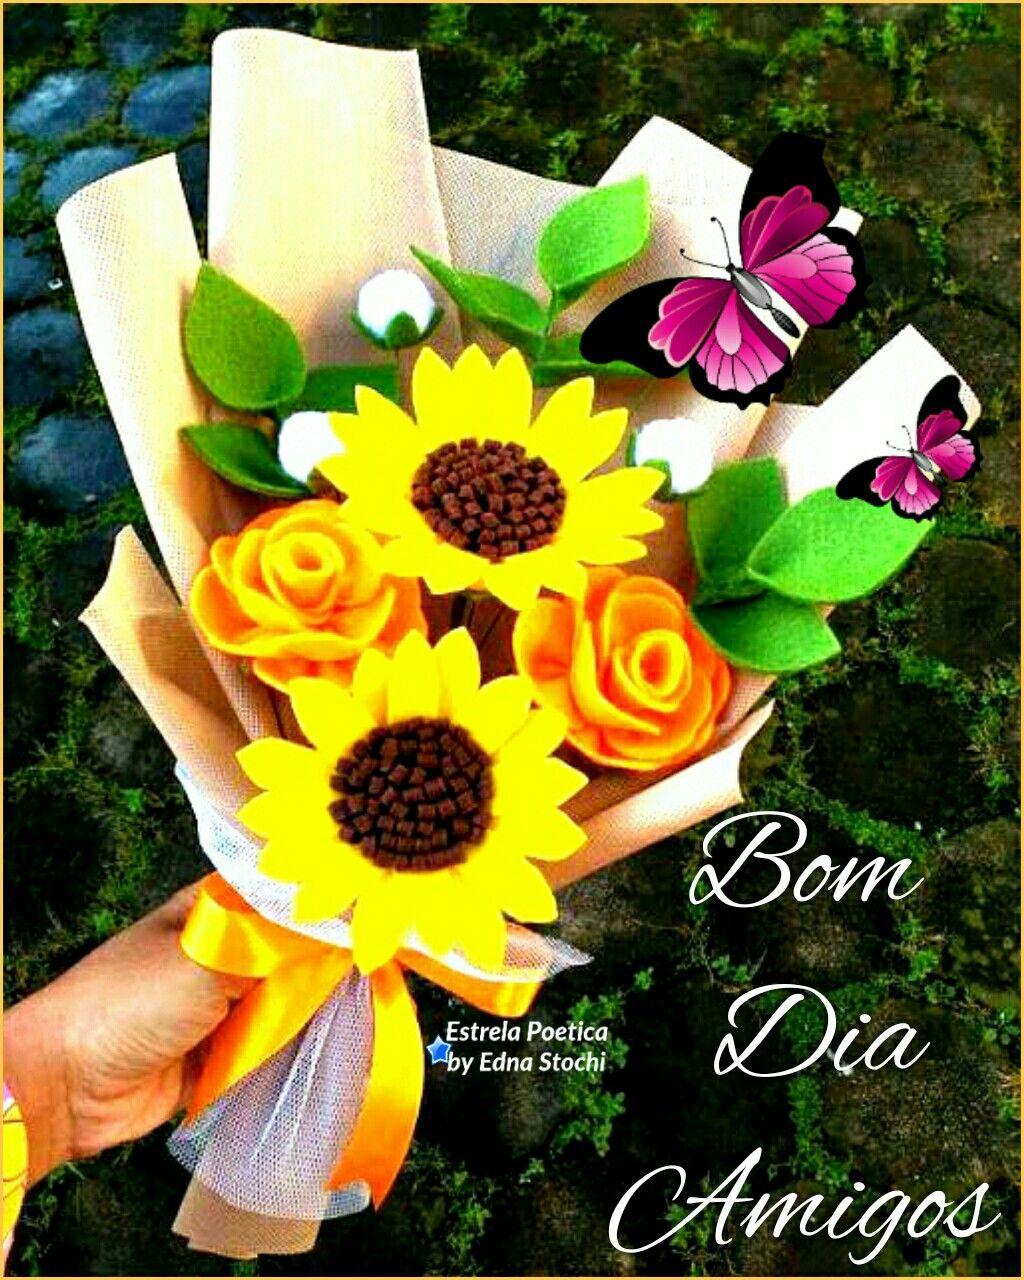 Bom Dia Bomdia Boatarde Boanoite Amigos Deus Frases Estrela